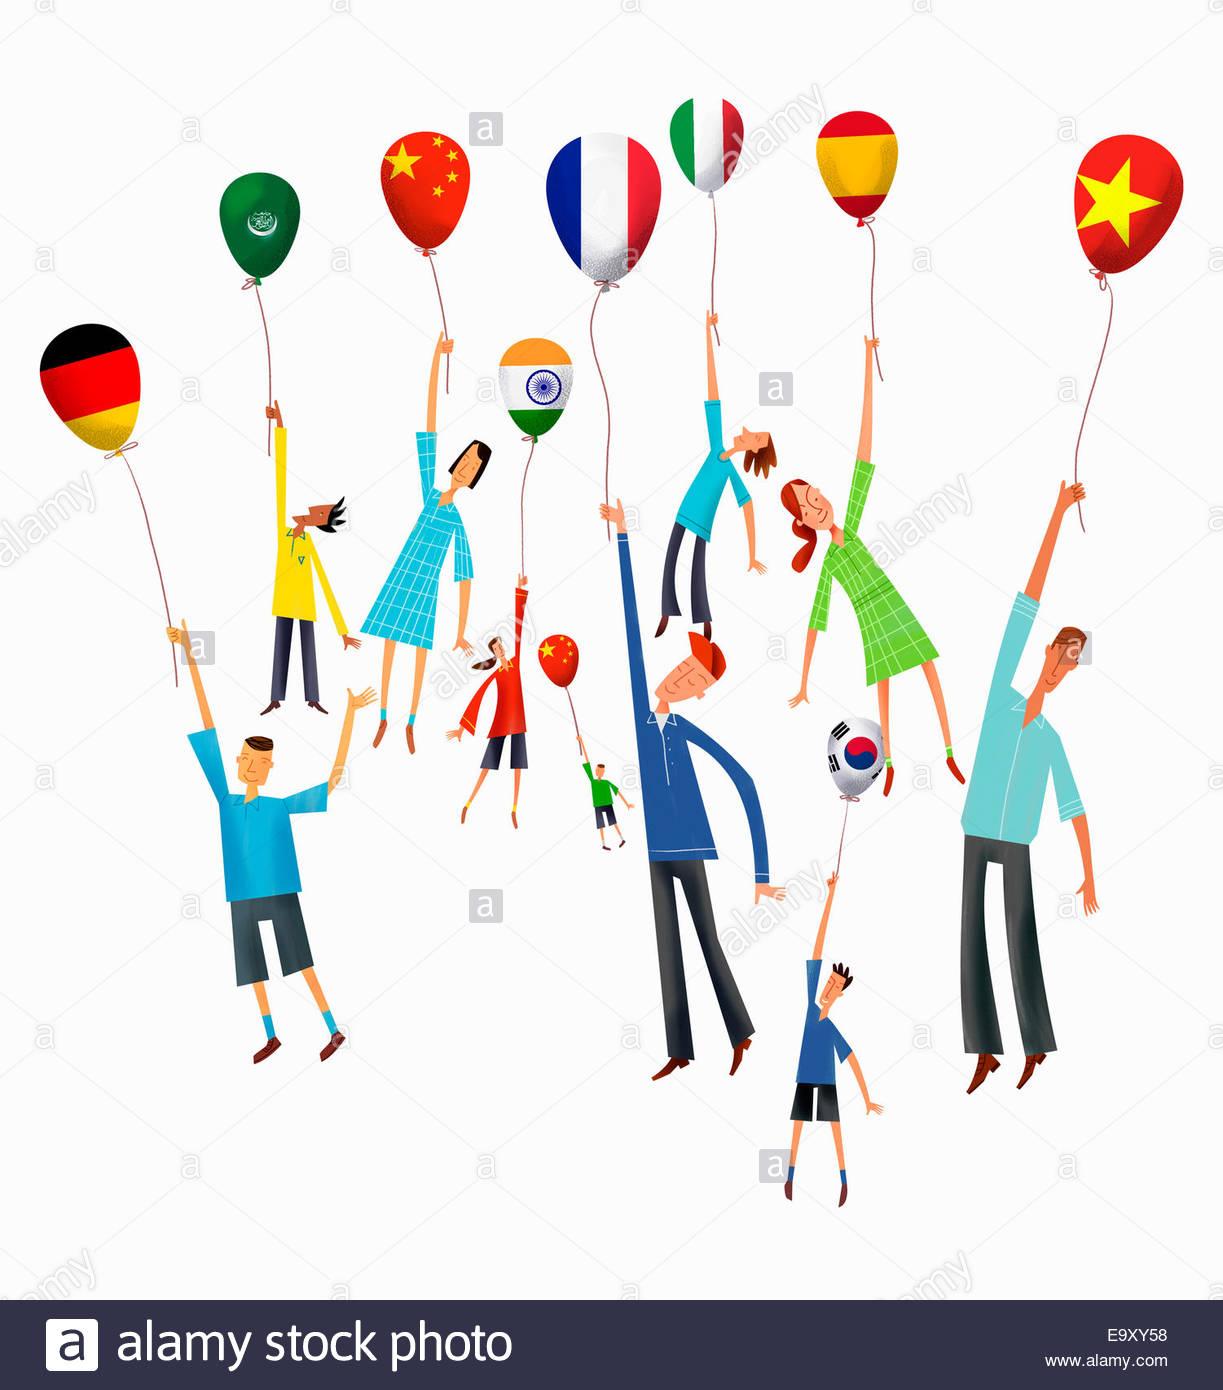 People rising holding international flag balloons - Stock Image